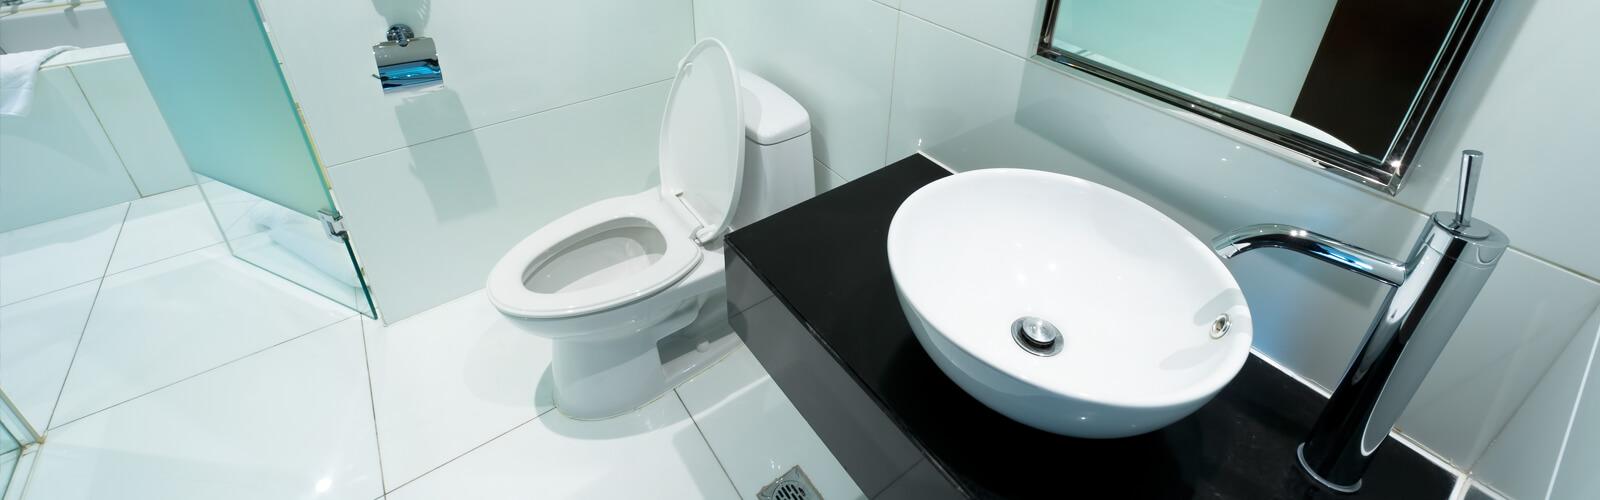 optimized_hotel-bad-toilet.jpg